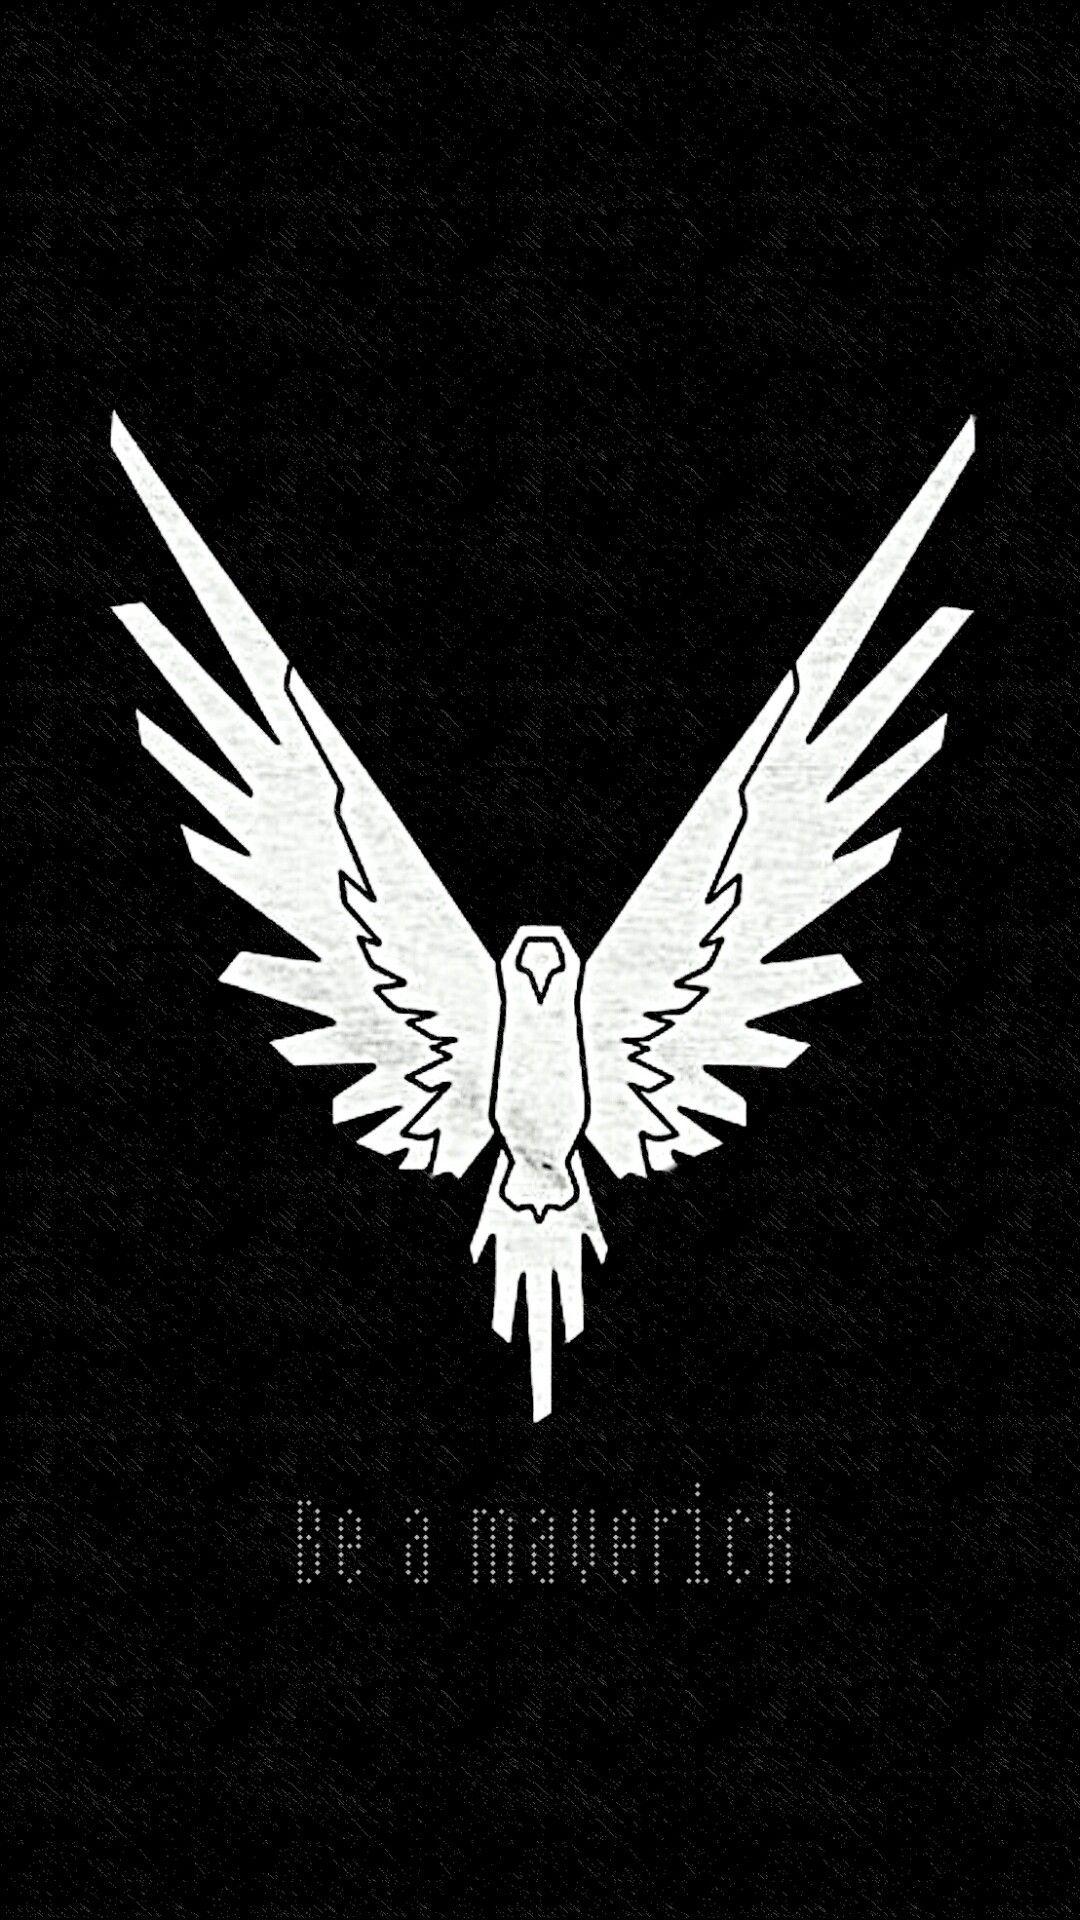 logan paul maverick logo be a maverick | be a maverick | pinterest